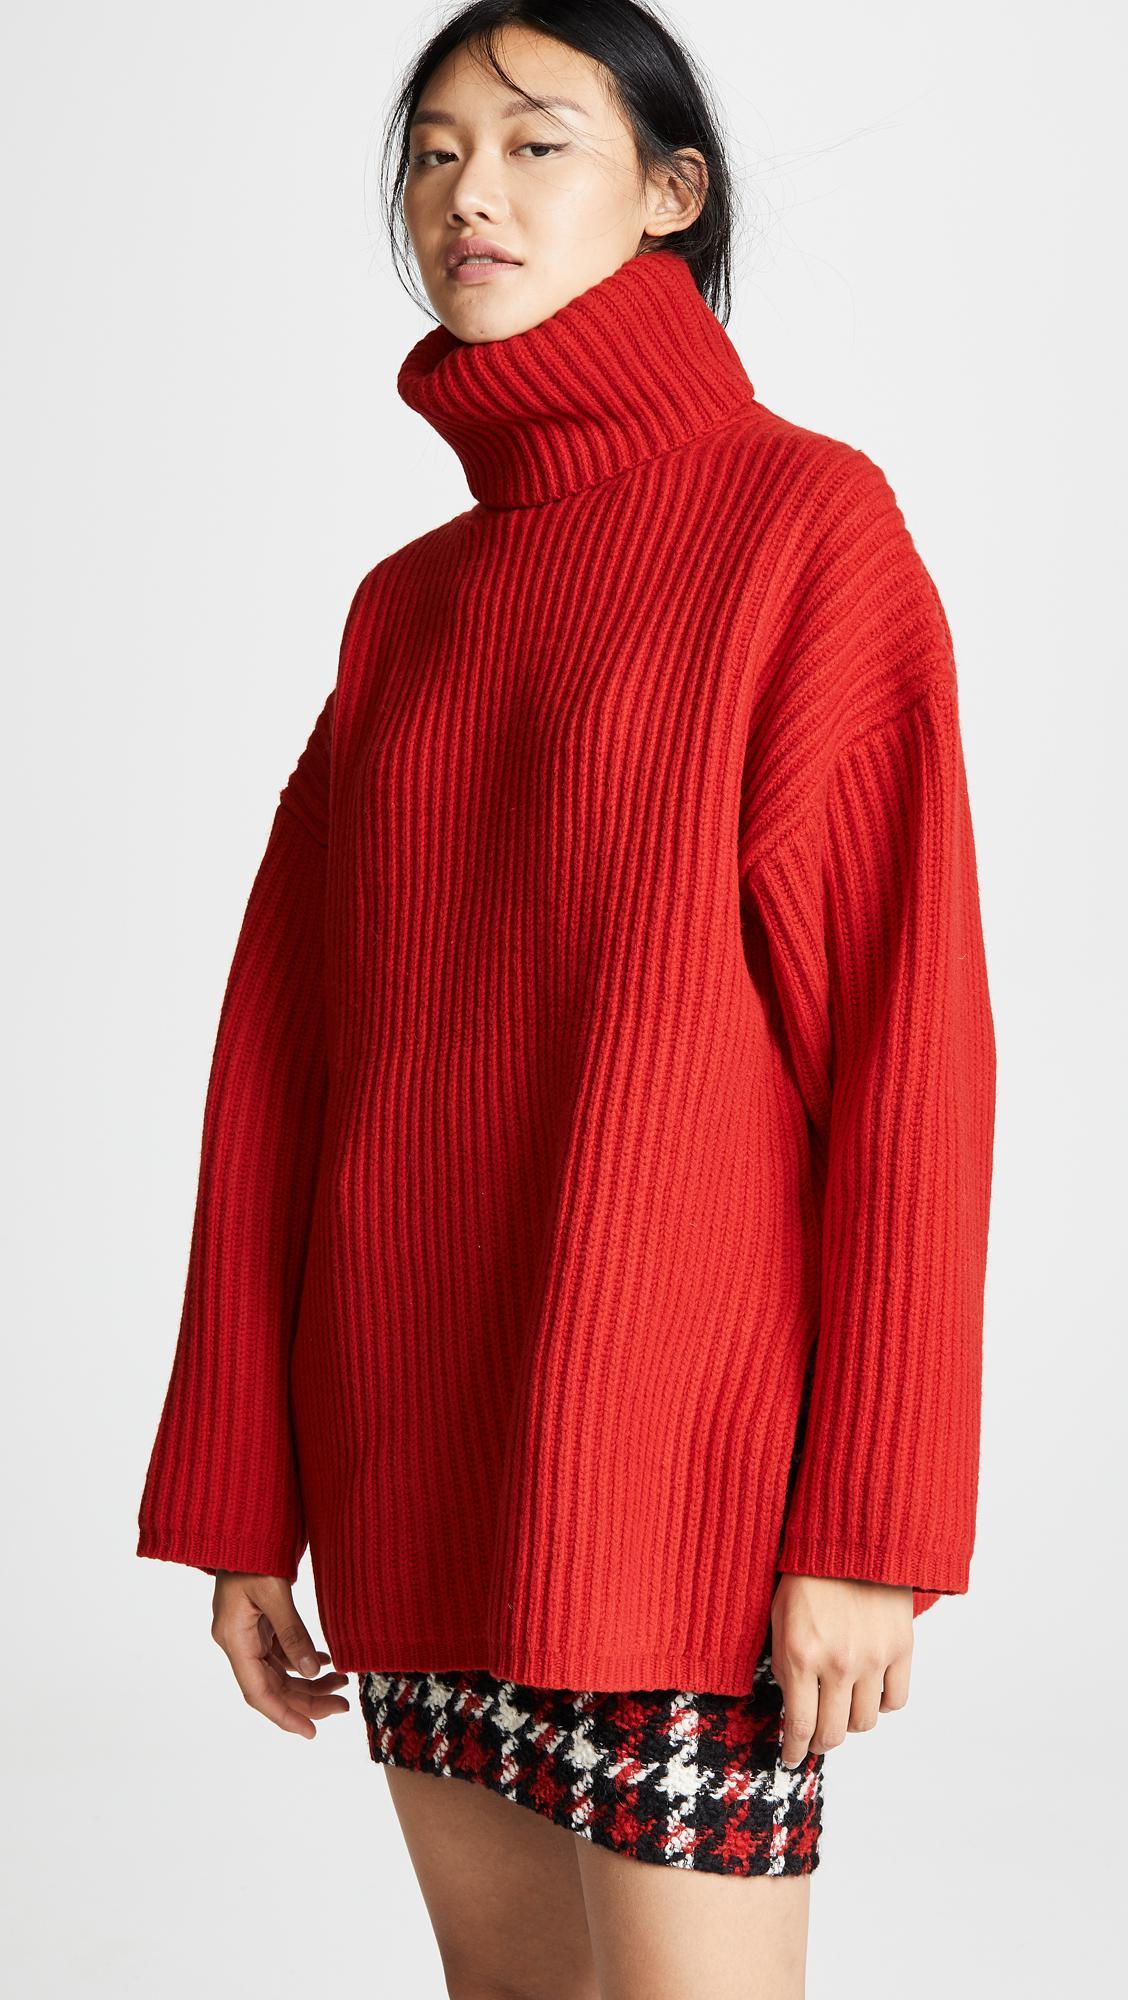 684c335949ea Lyst - Acne Studios Oversized Turtleneck Sweater in Red